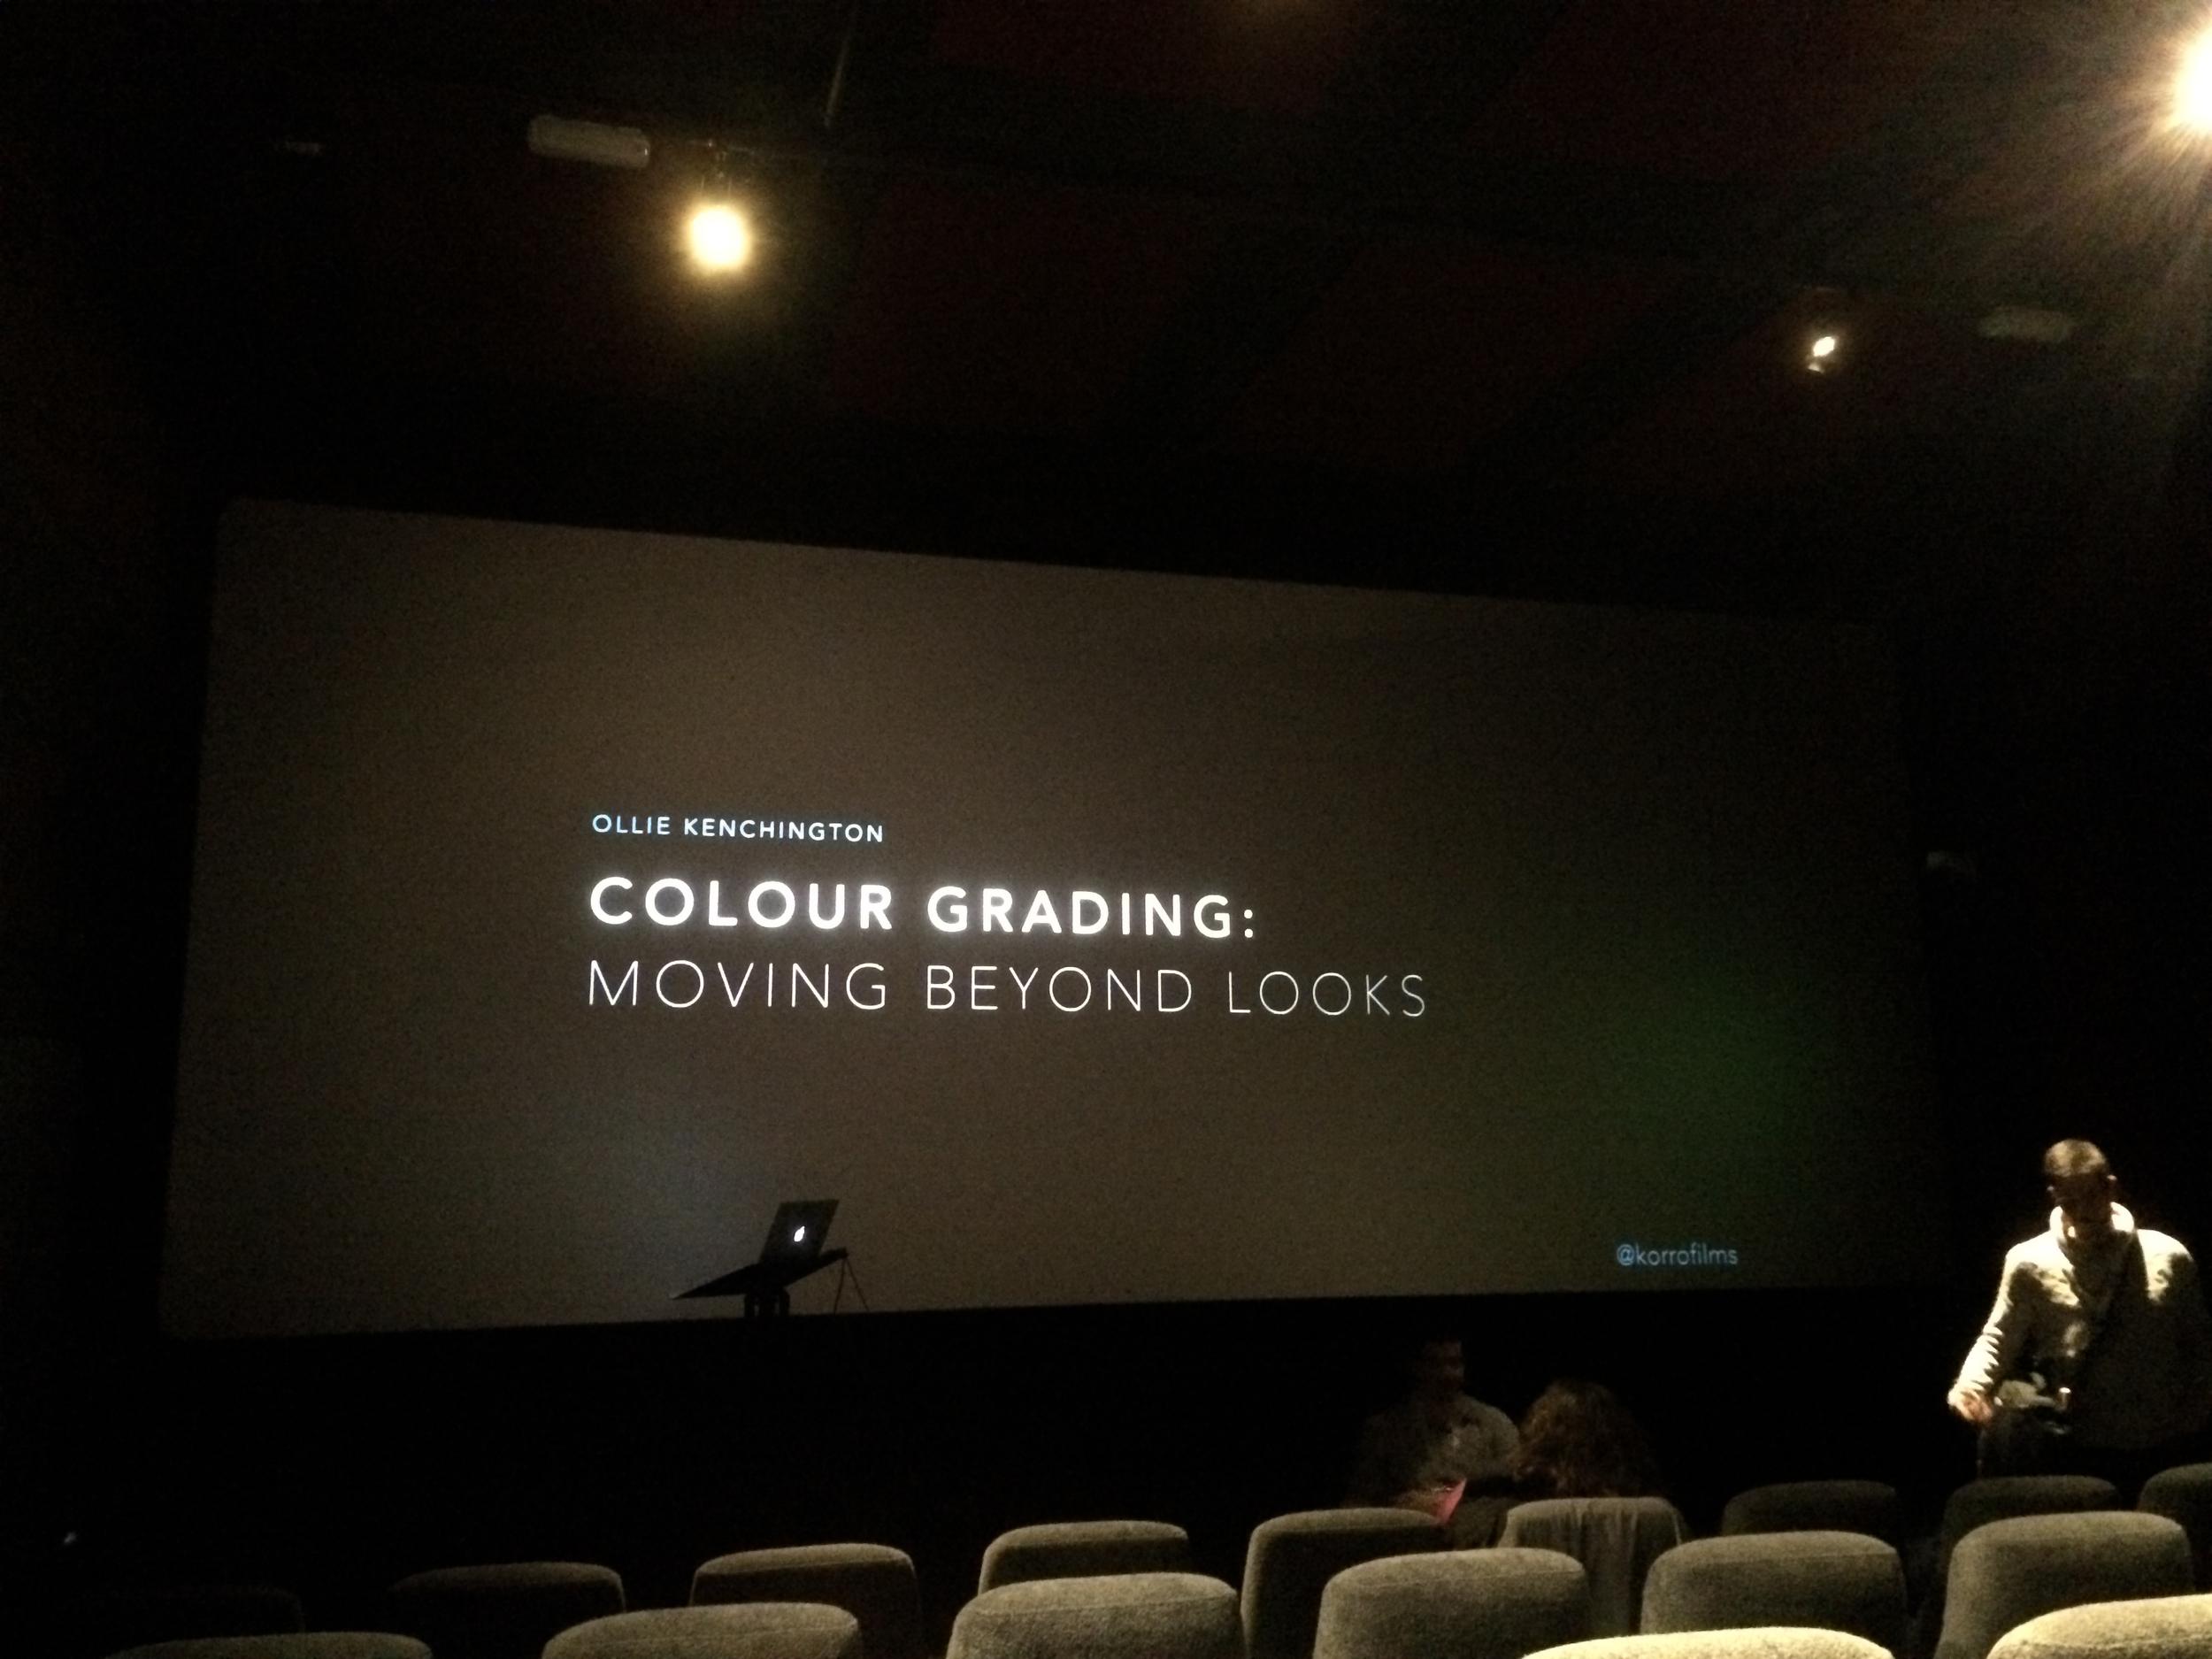 Ollie Kenchington Colour Grading presentation Shadows and Light